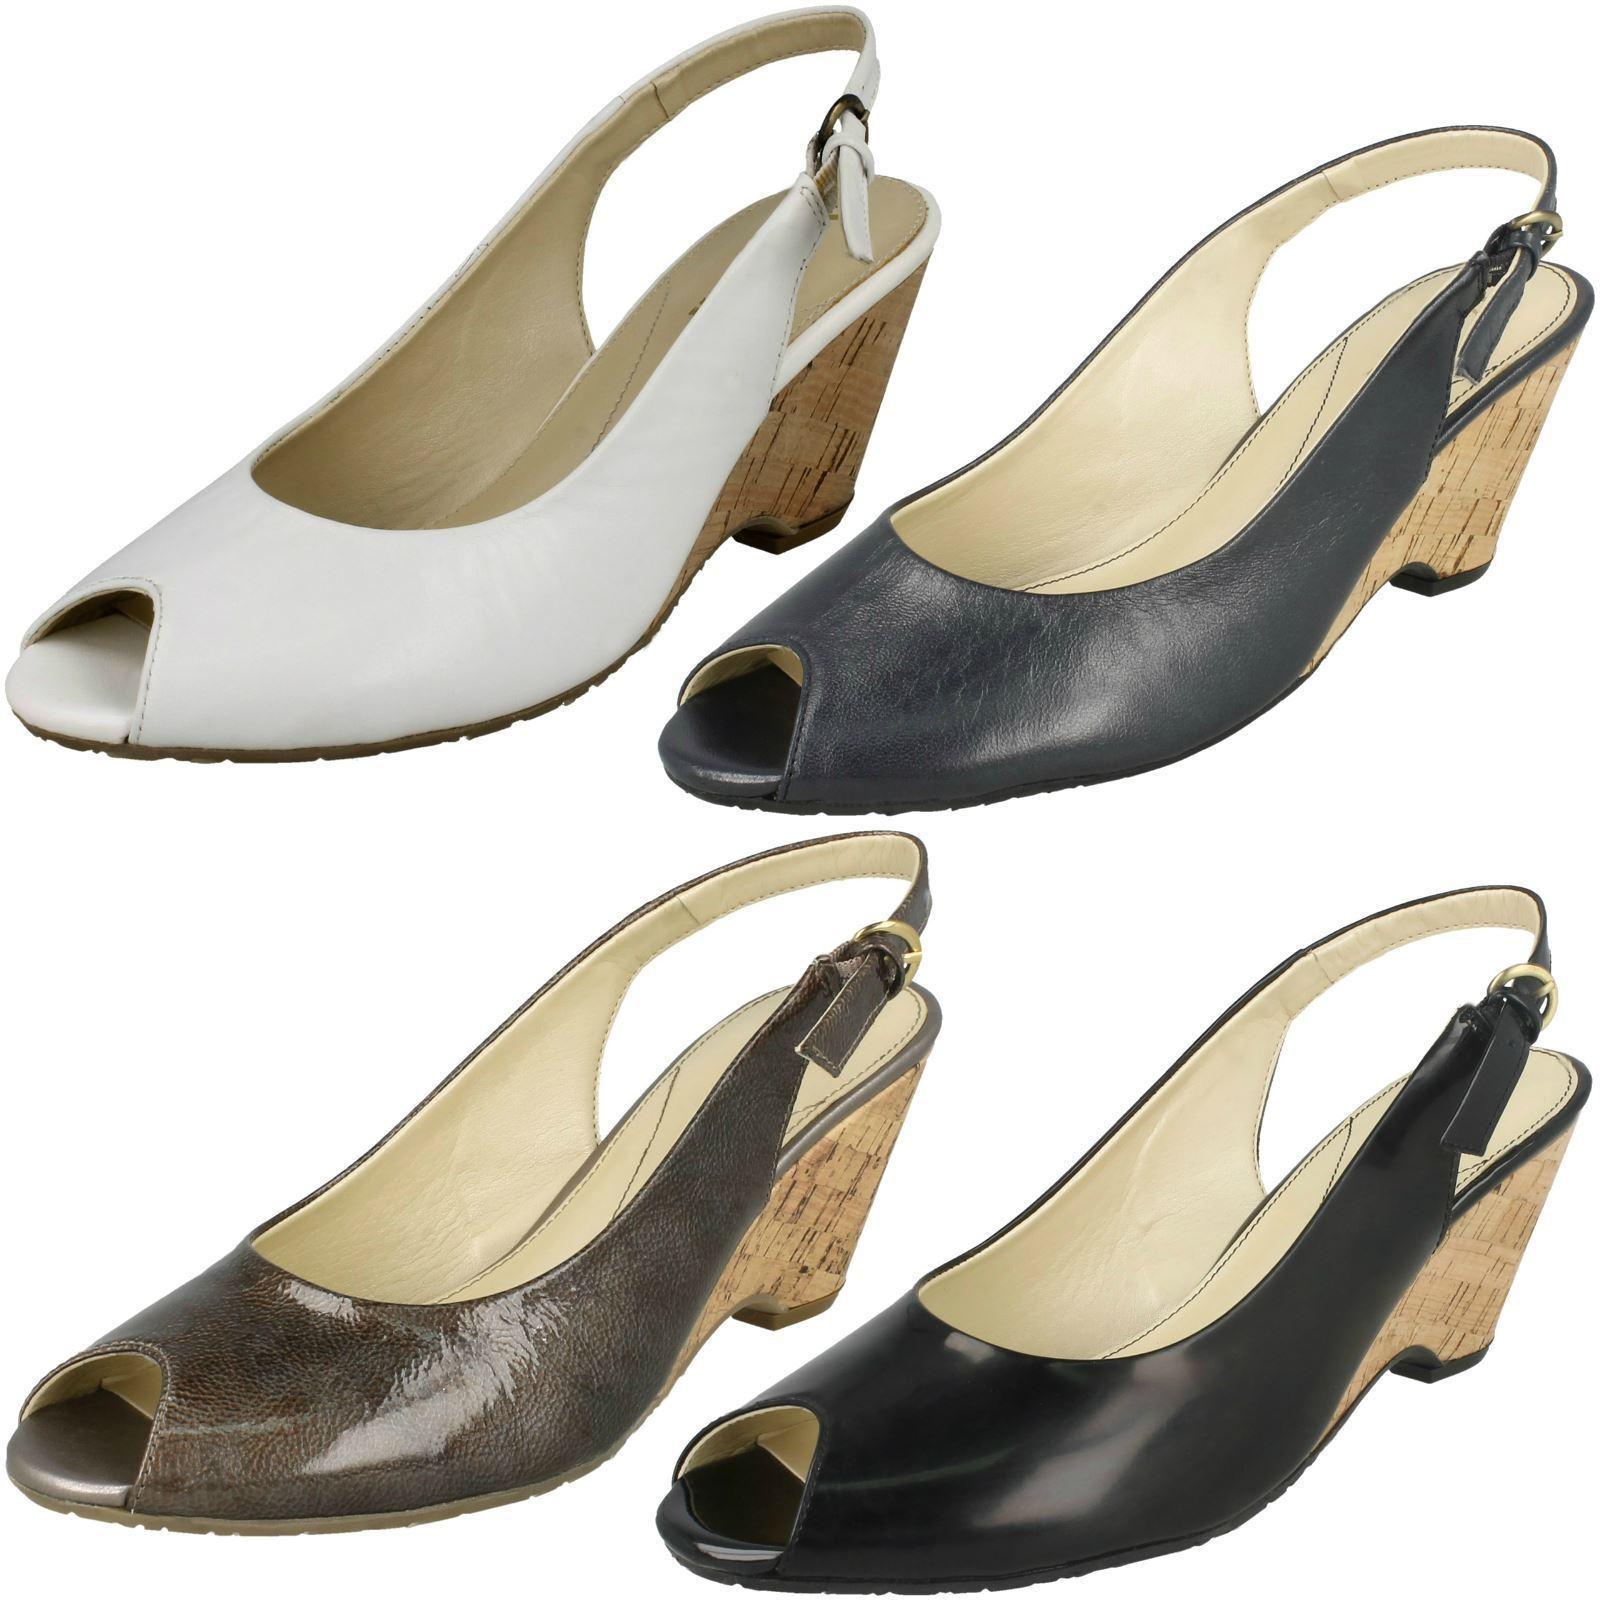 Damen Metall Feature Sling van dalwedge Peeptoe Absatz Schuhe / Sandale Cadiz